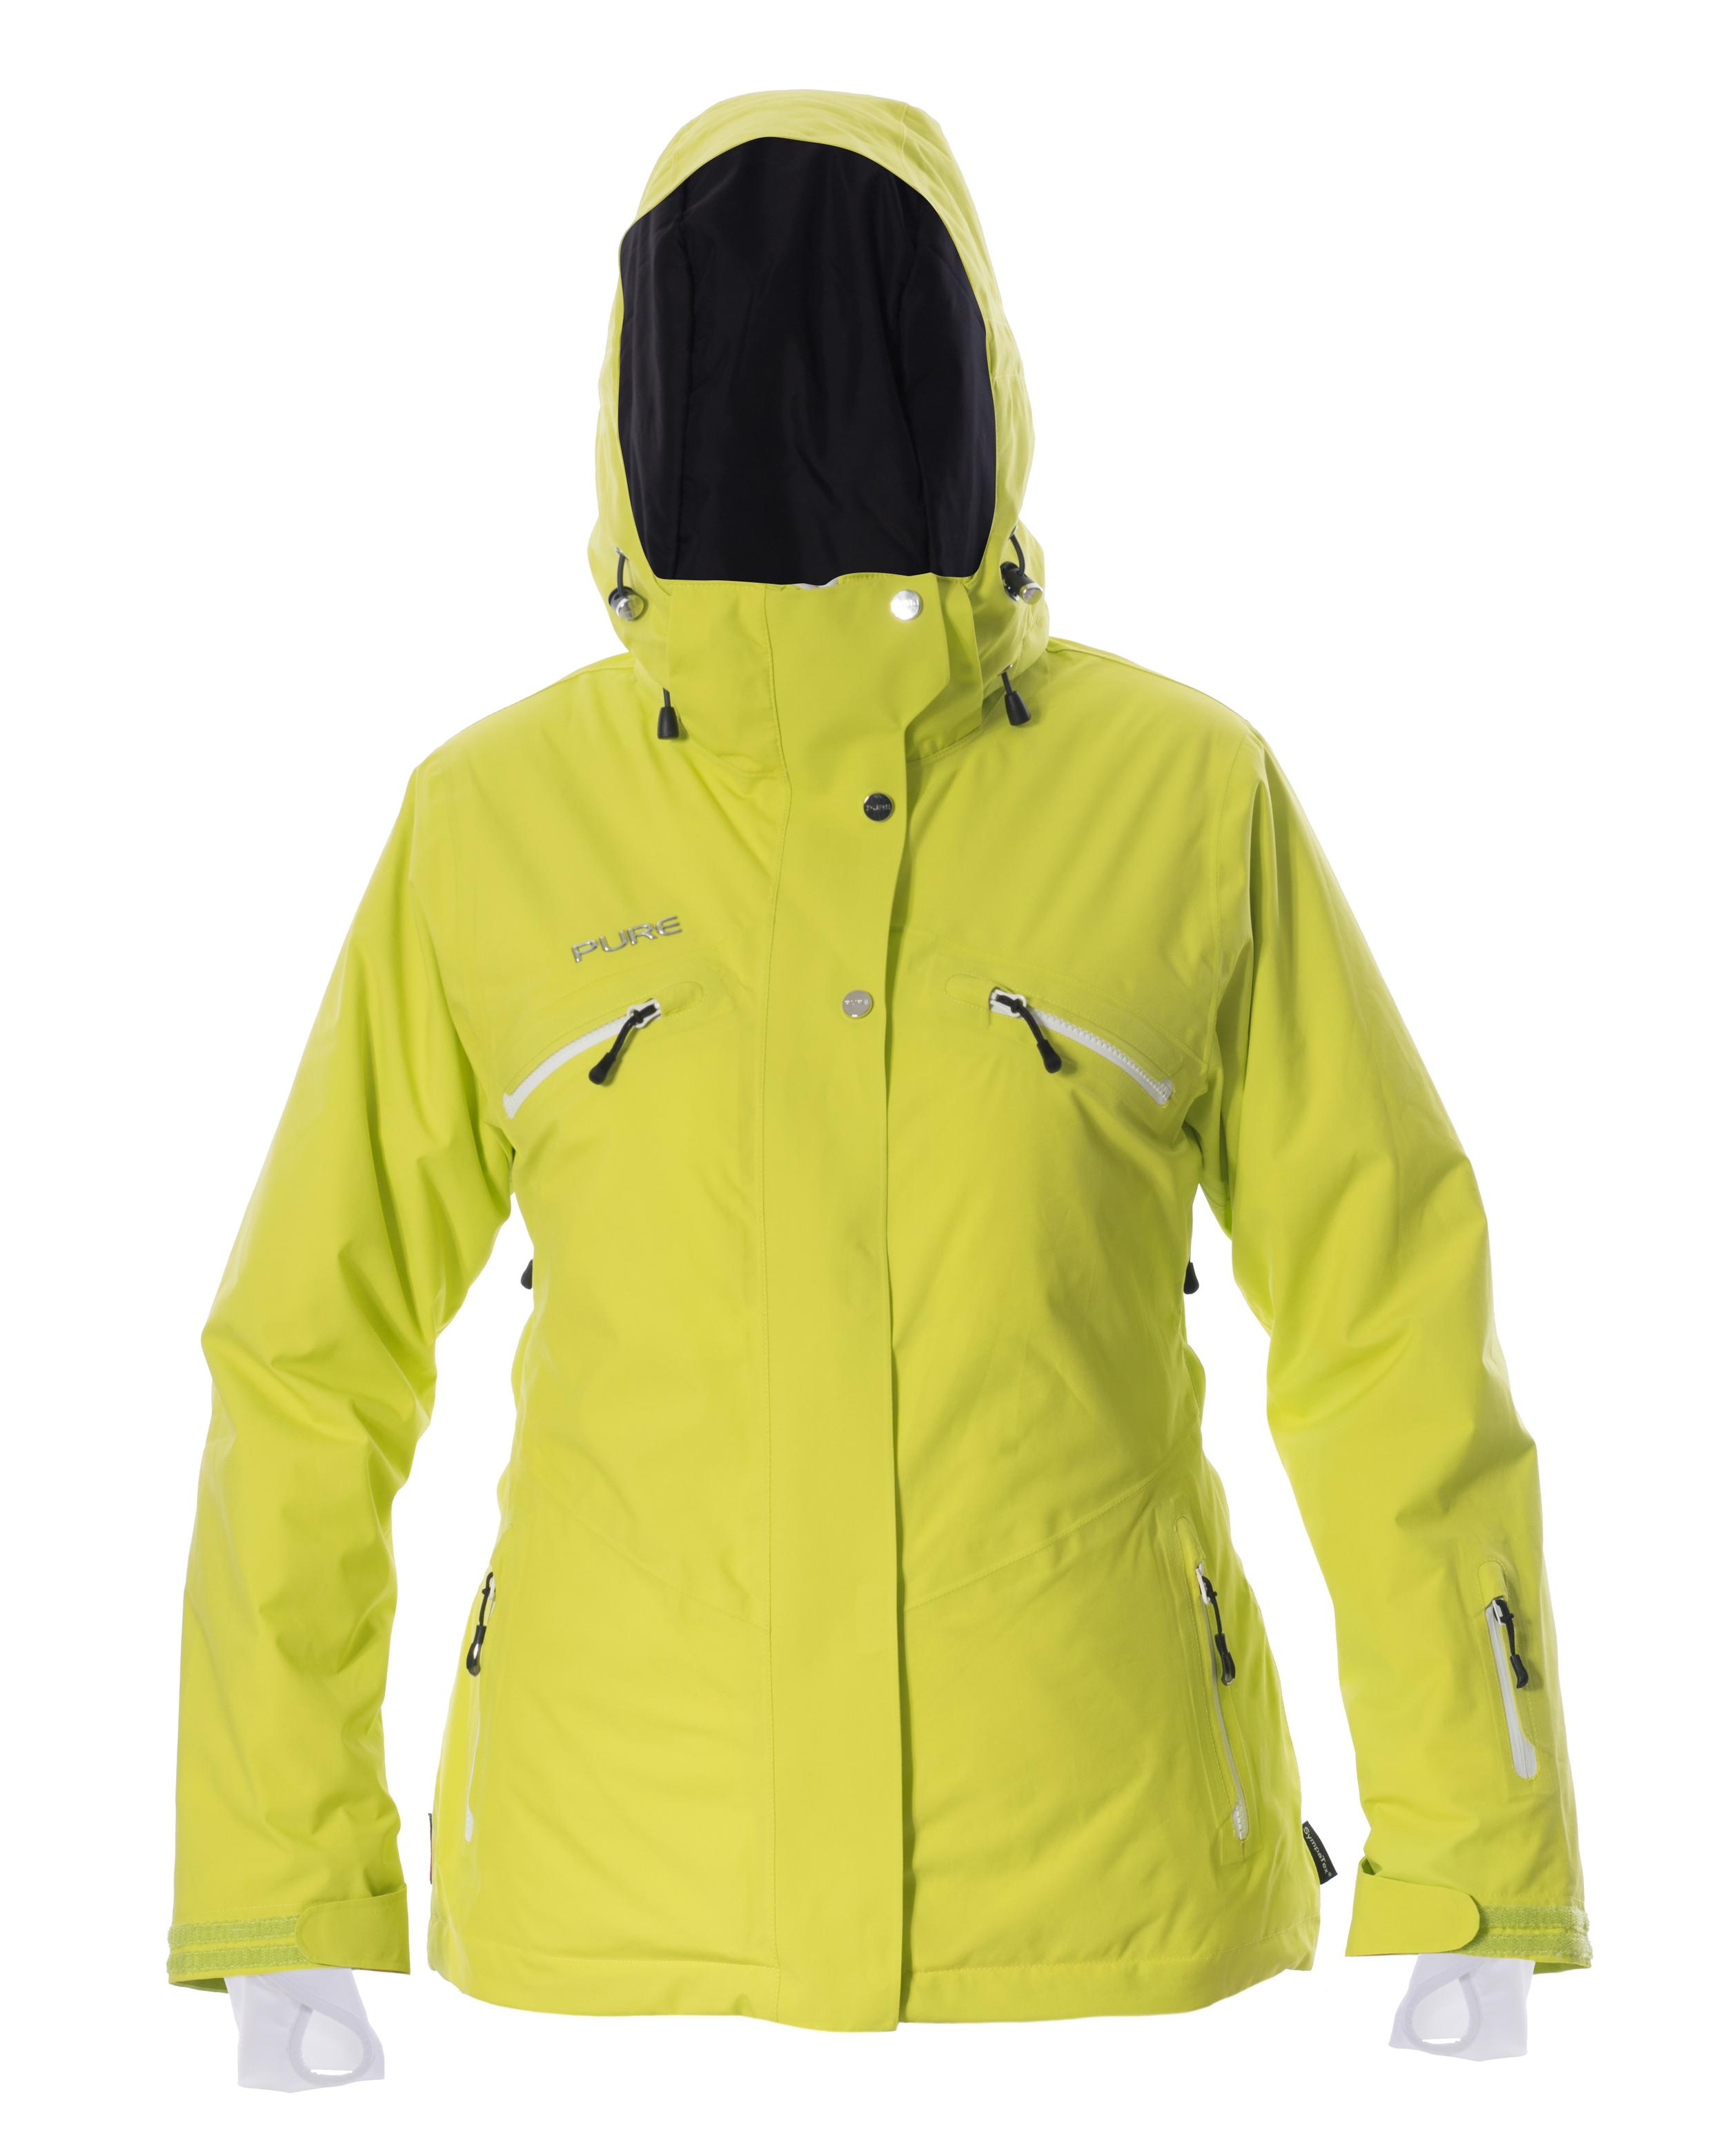 Cortina Women's Pure Snow - Lime